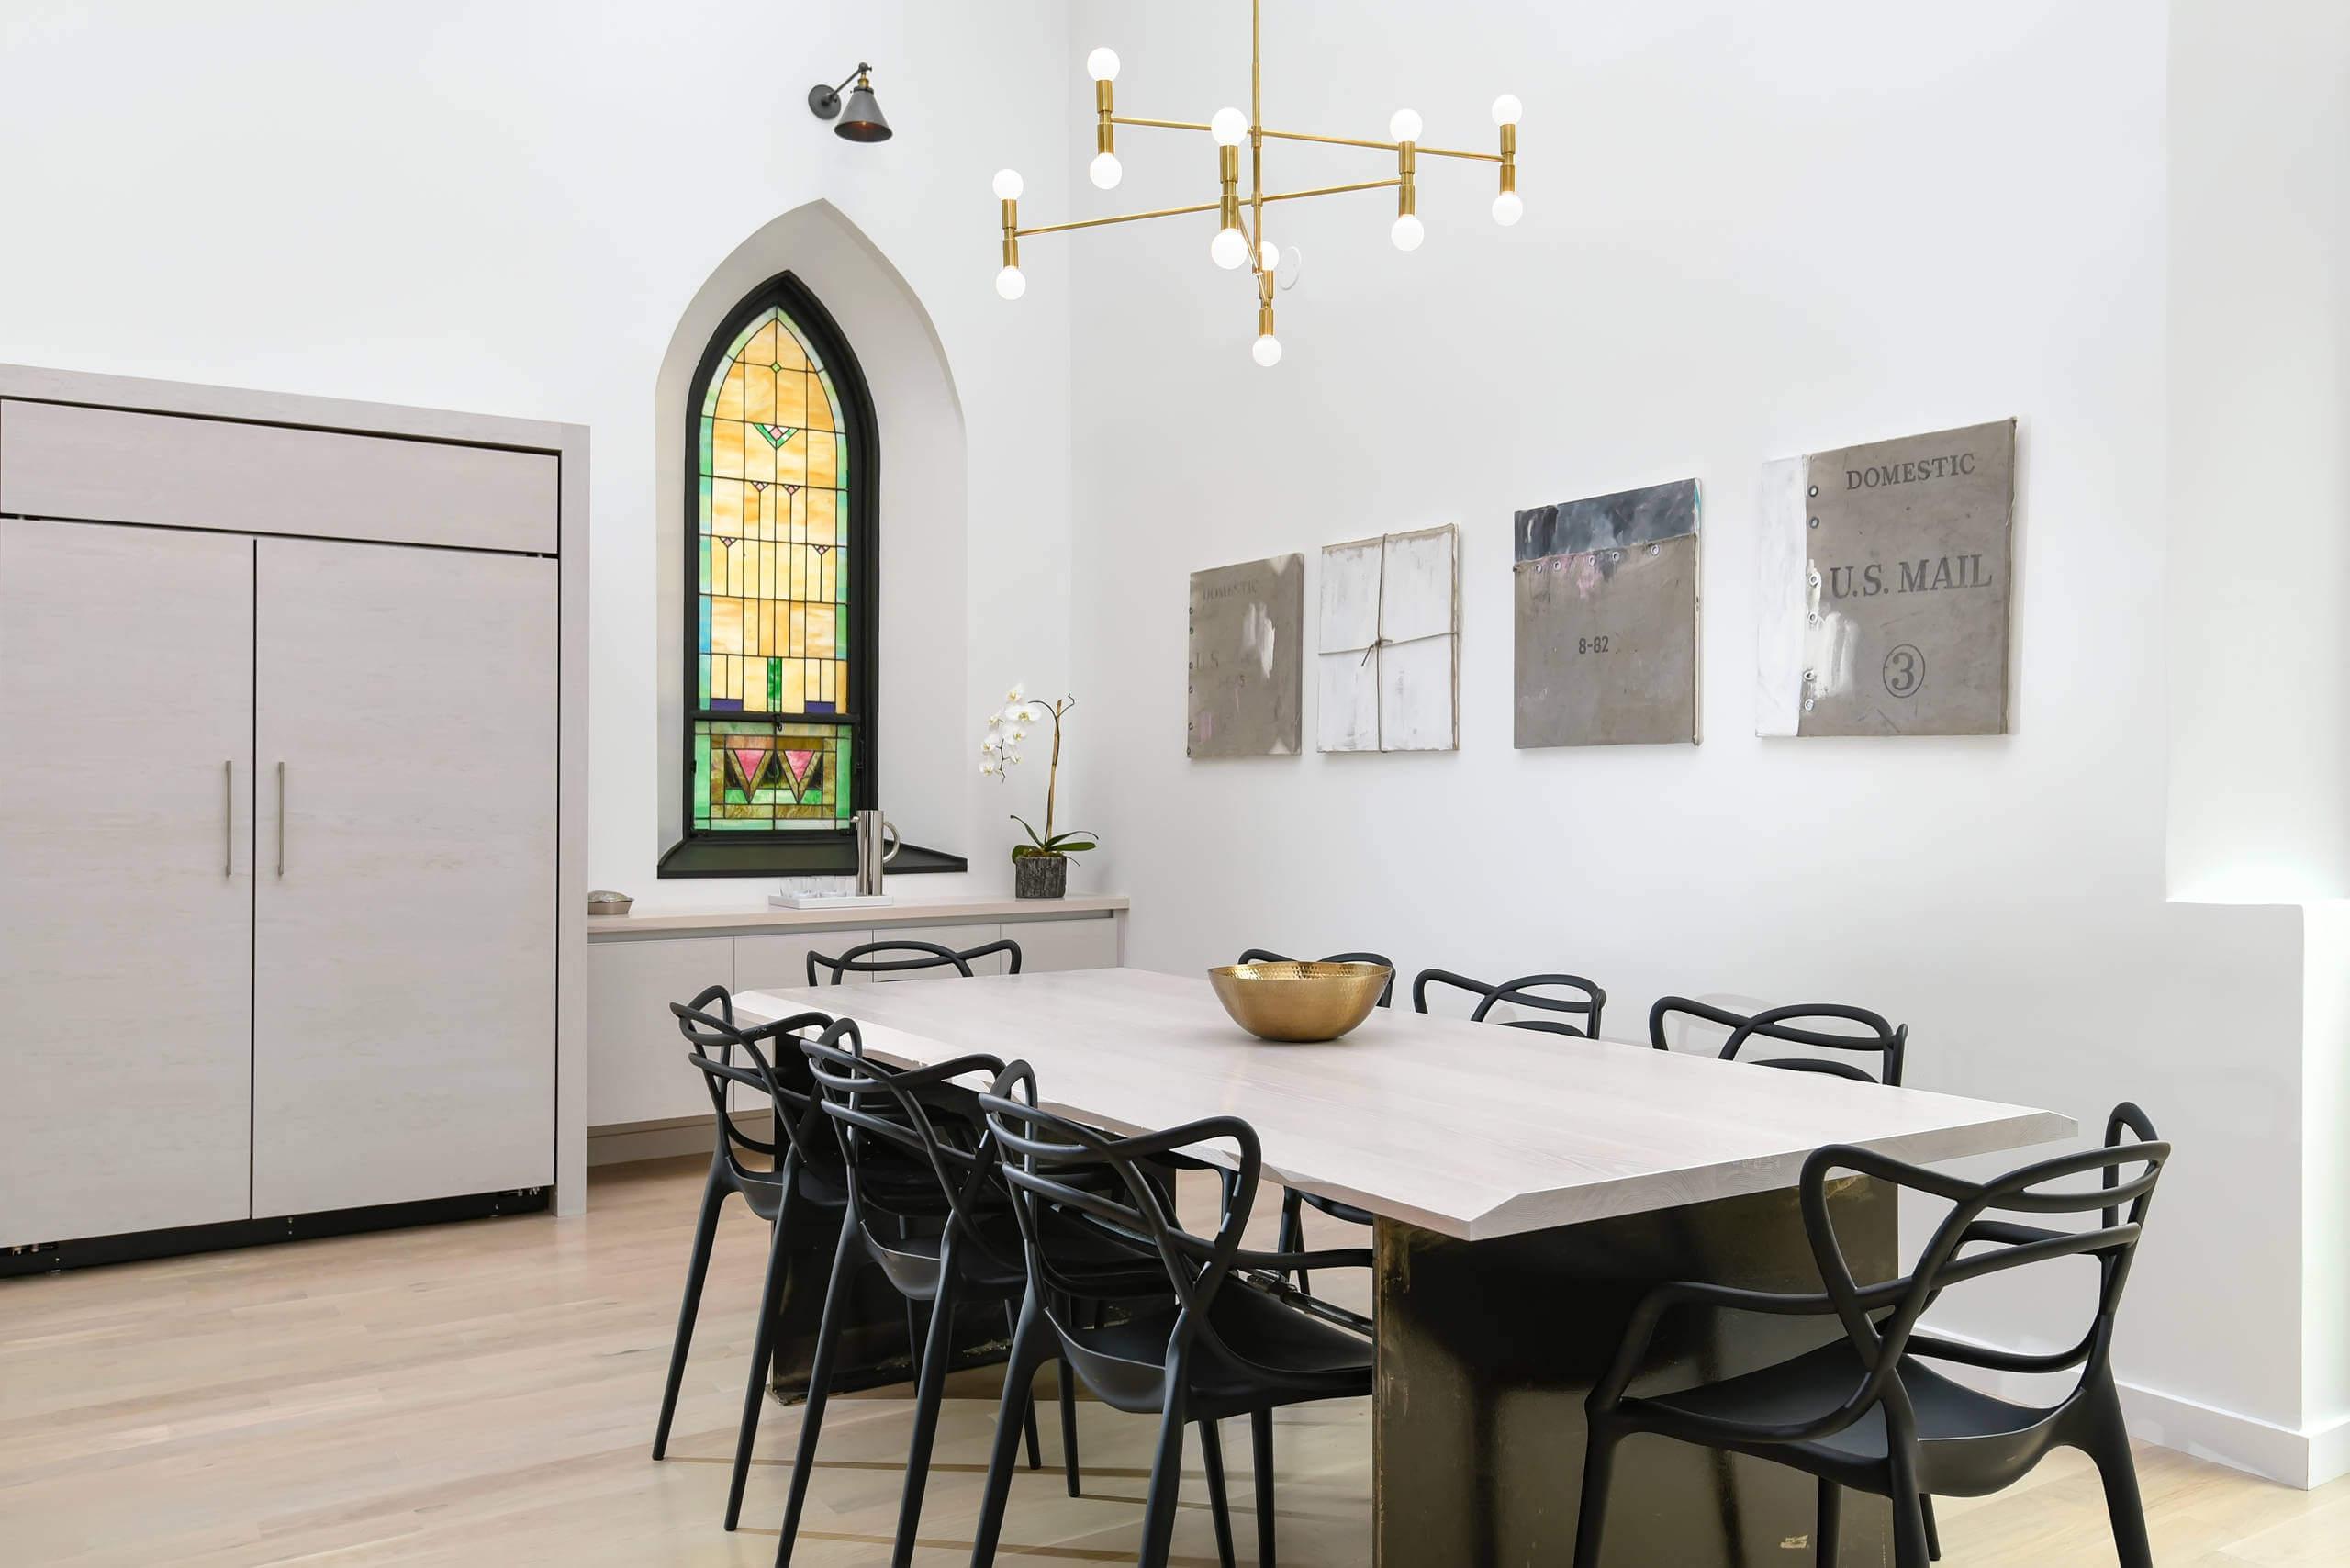 church-conversion-linc-thelen-design-05